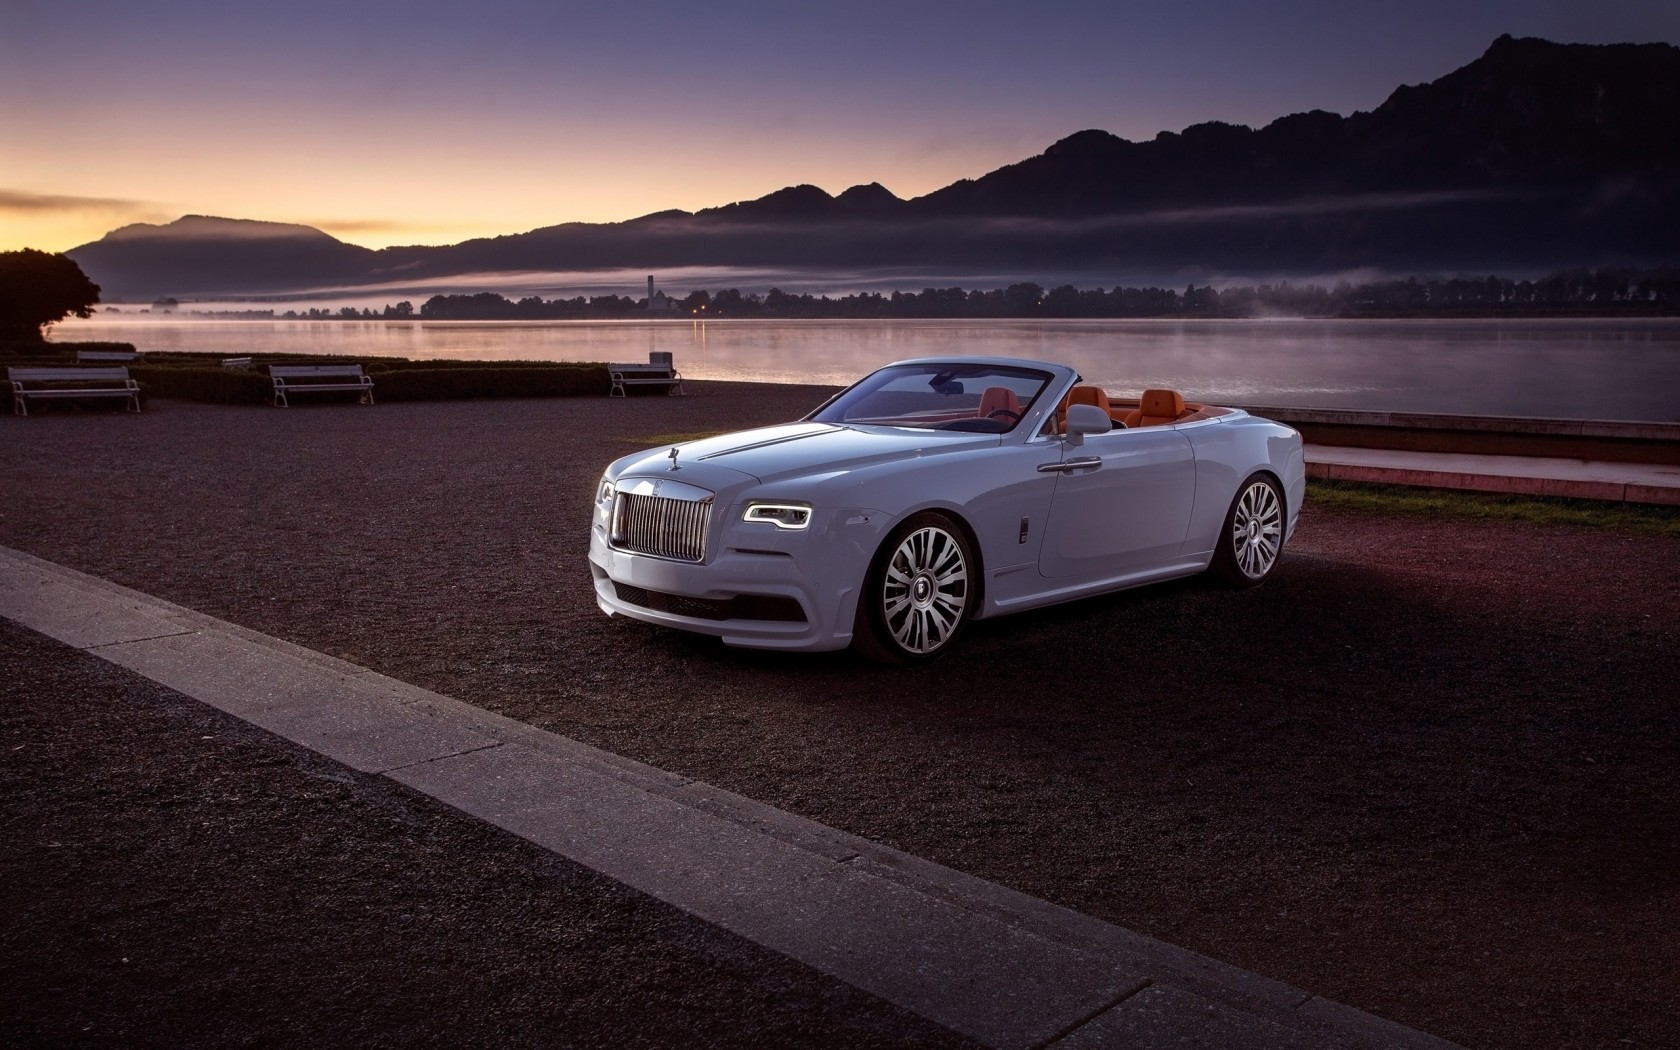 2016 Spofec Rolls Royce Dawn 3 Wallpaper